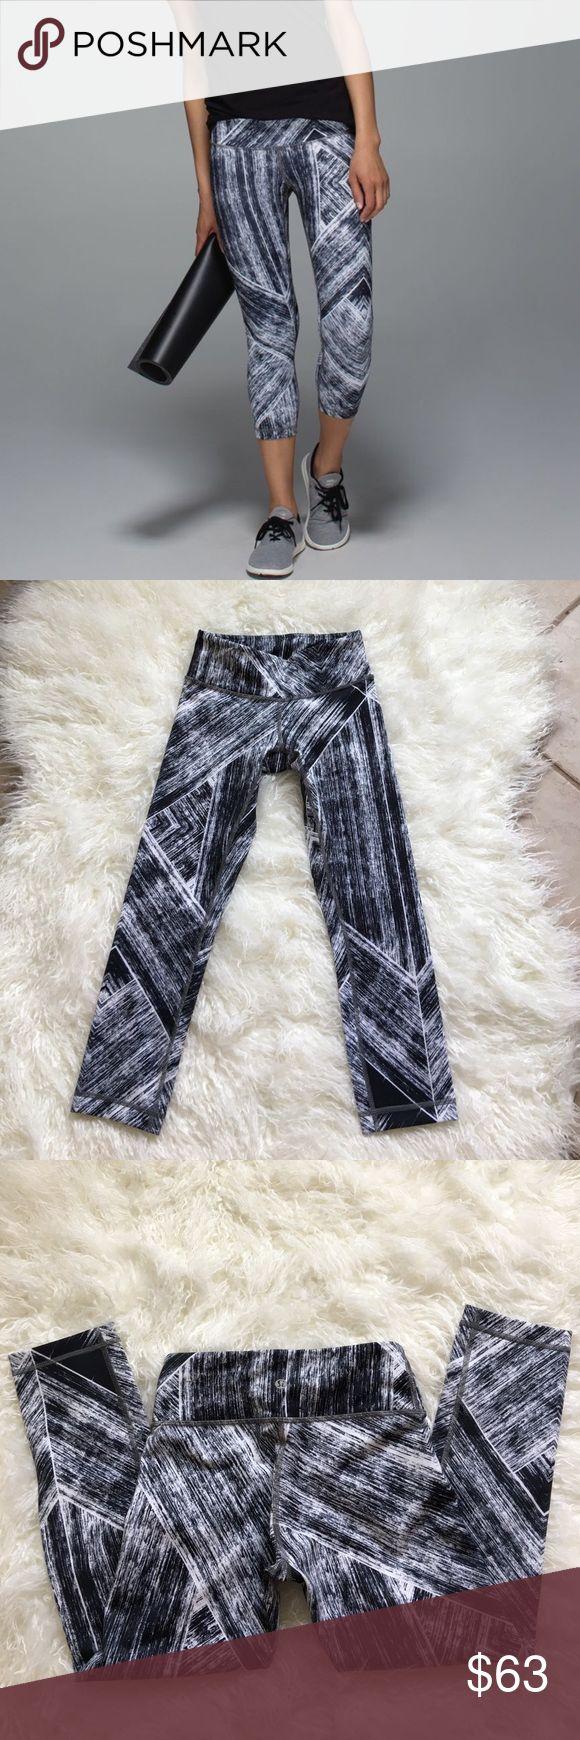 NWOT Lululemon Heat Wave Wunder Under Crop In excellent condition no flaws never worn. lululemon athletica Pants Ankle & Cropped